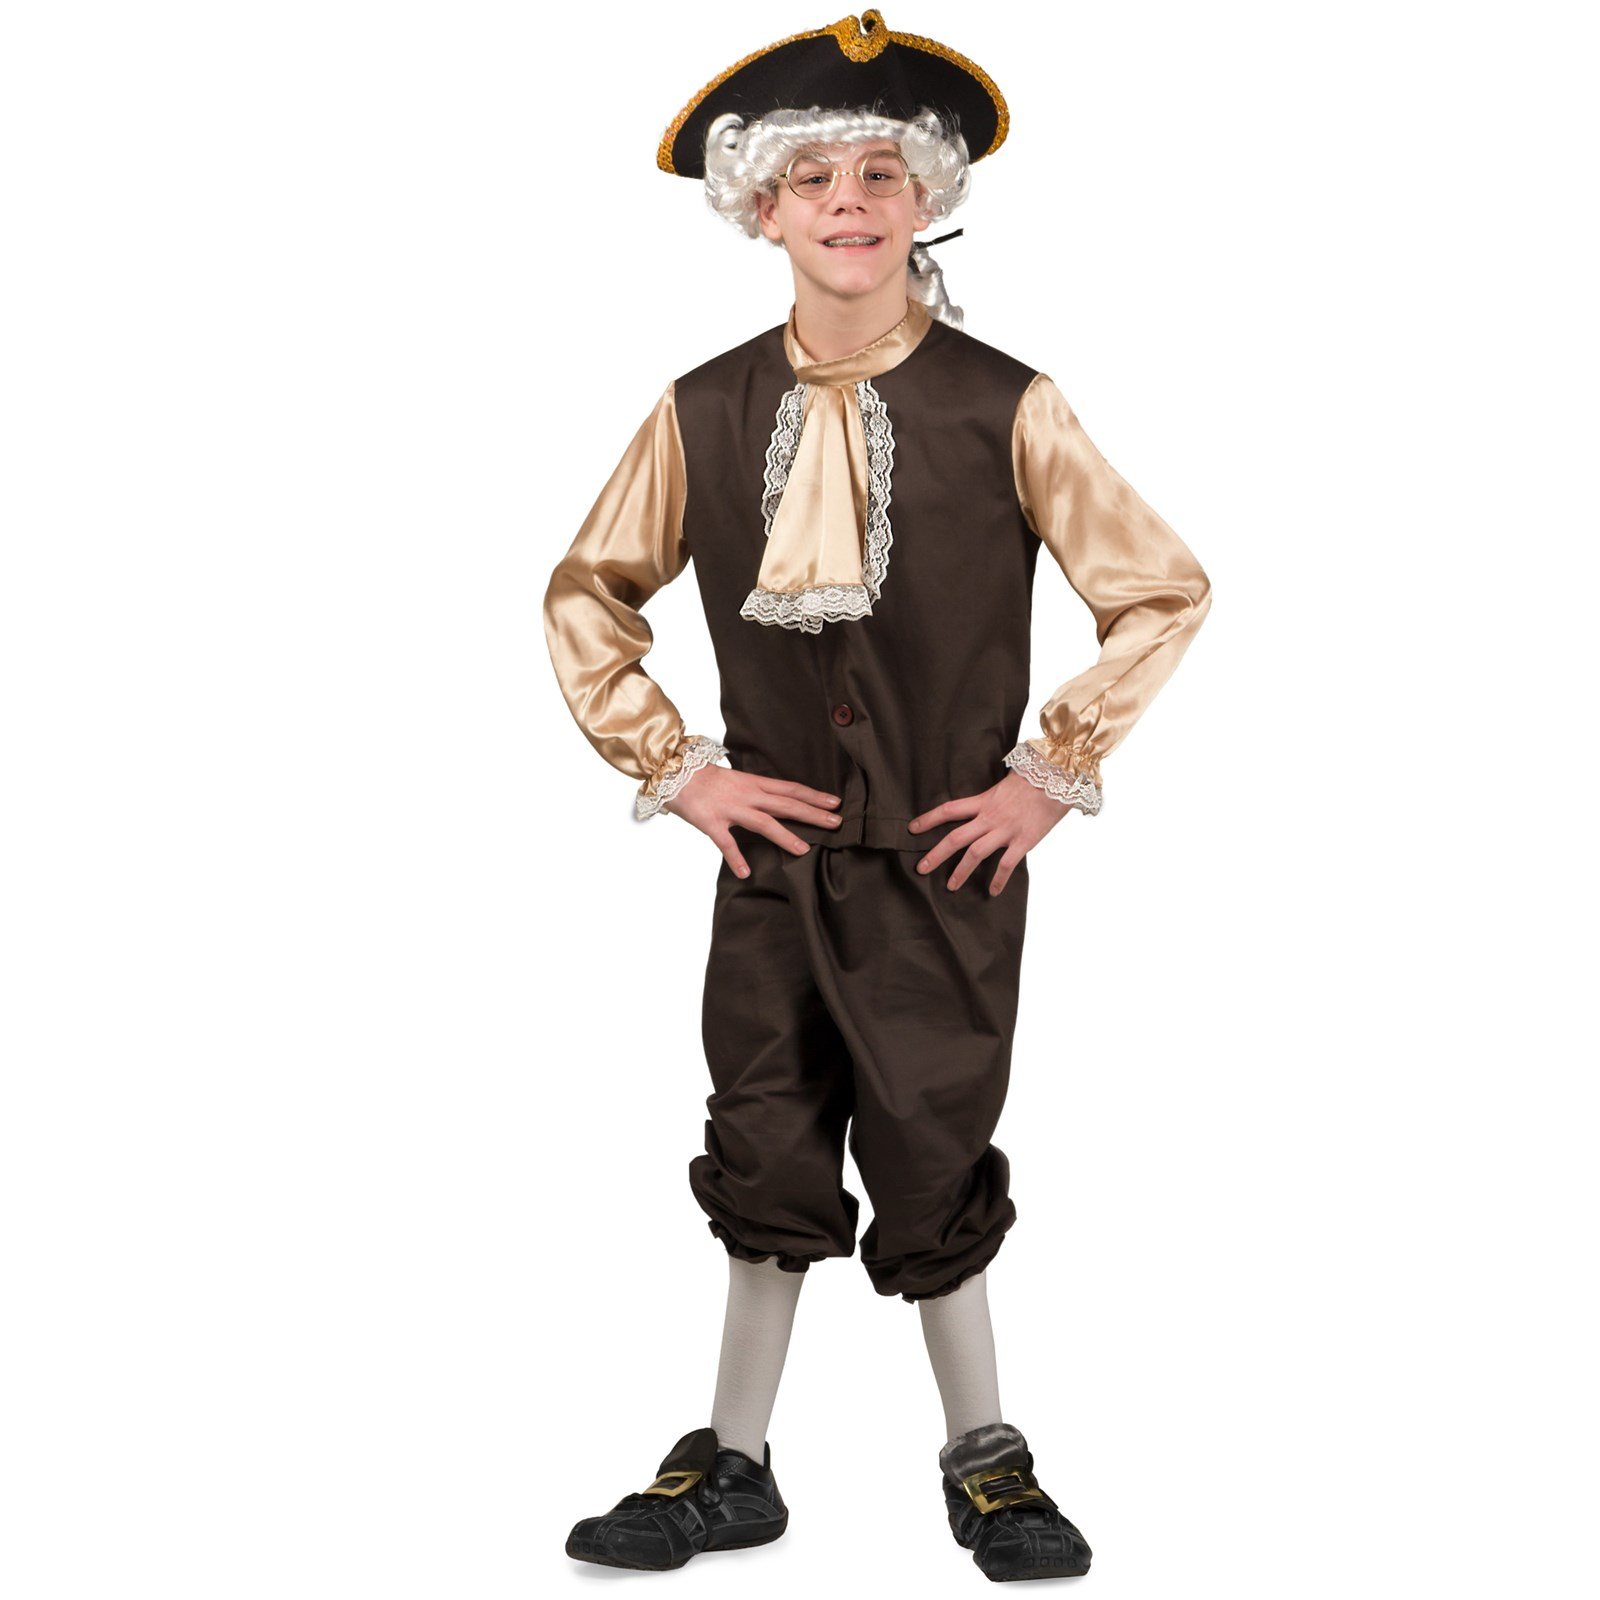 Boy's Colonial Costumeû